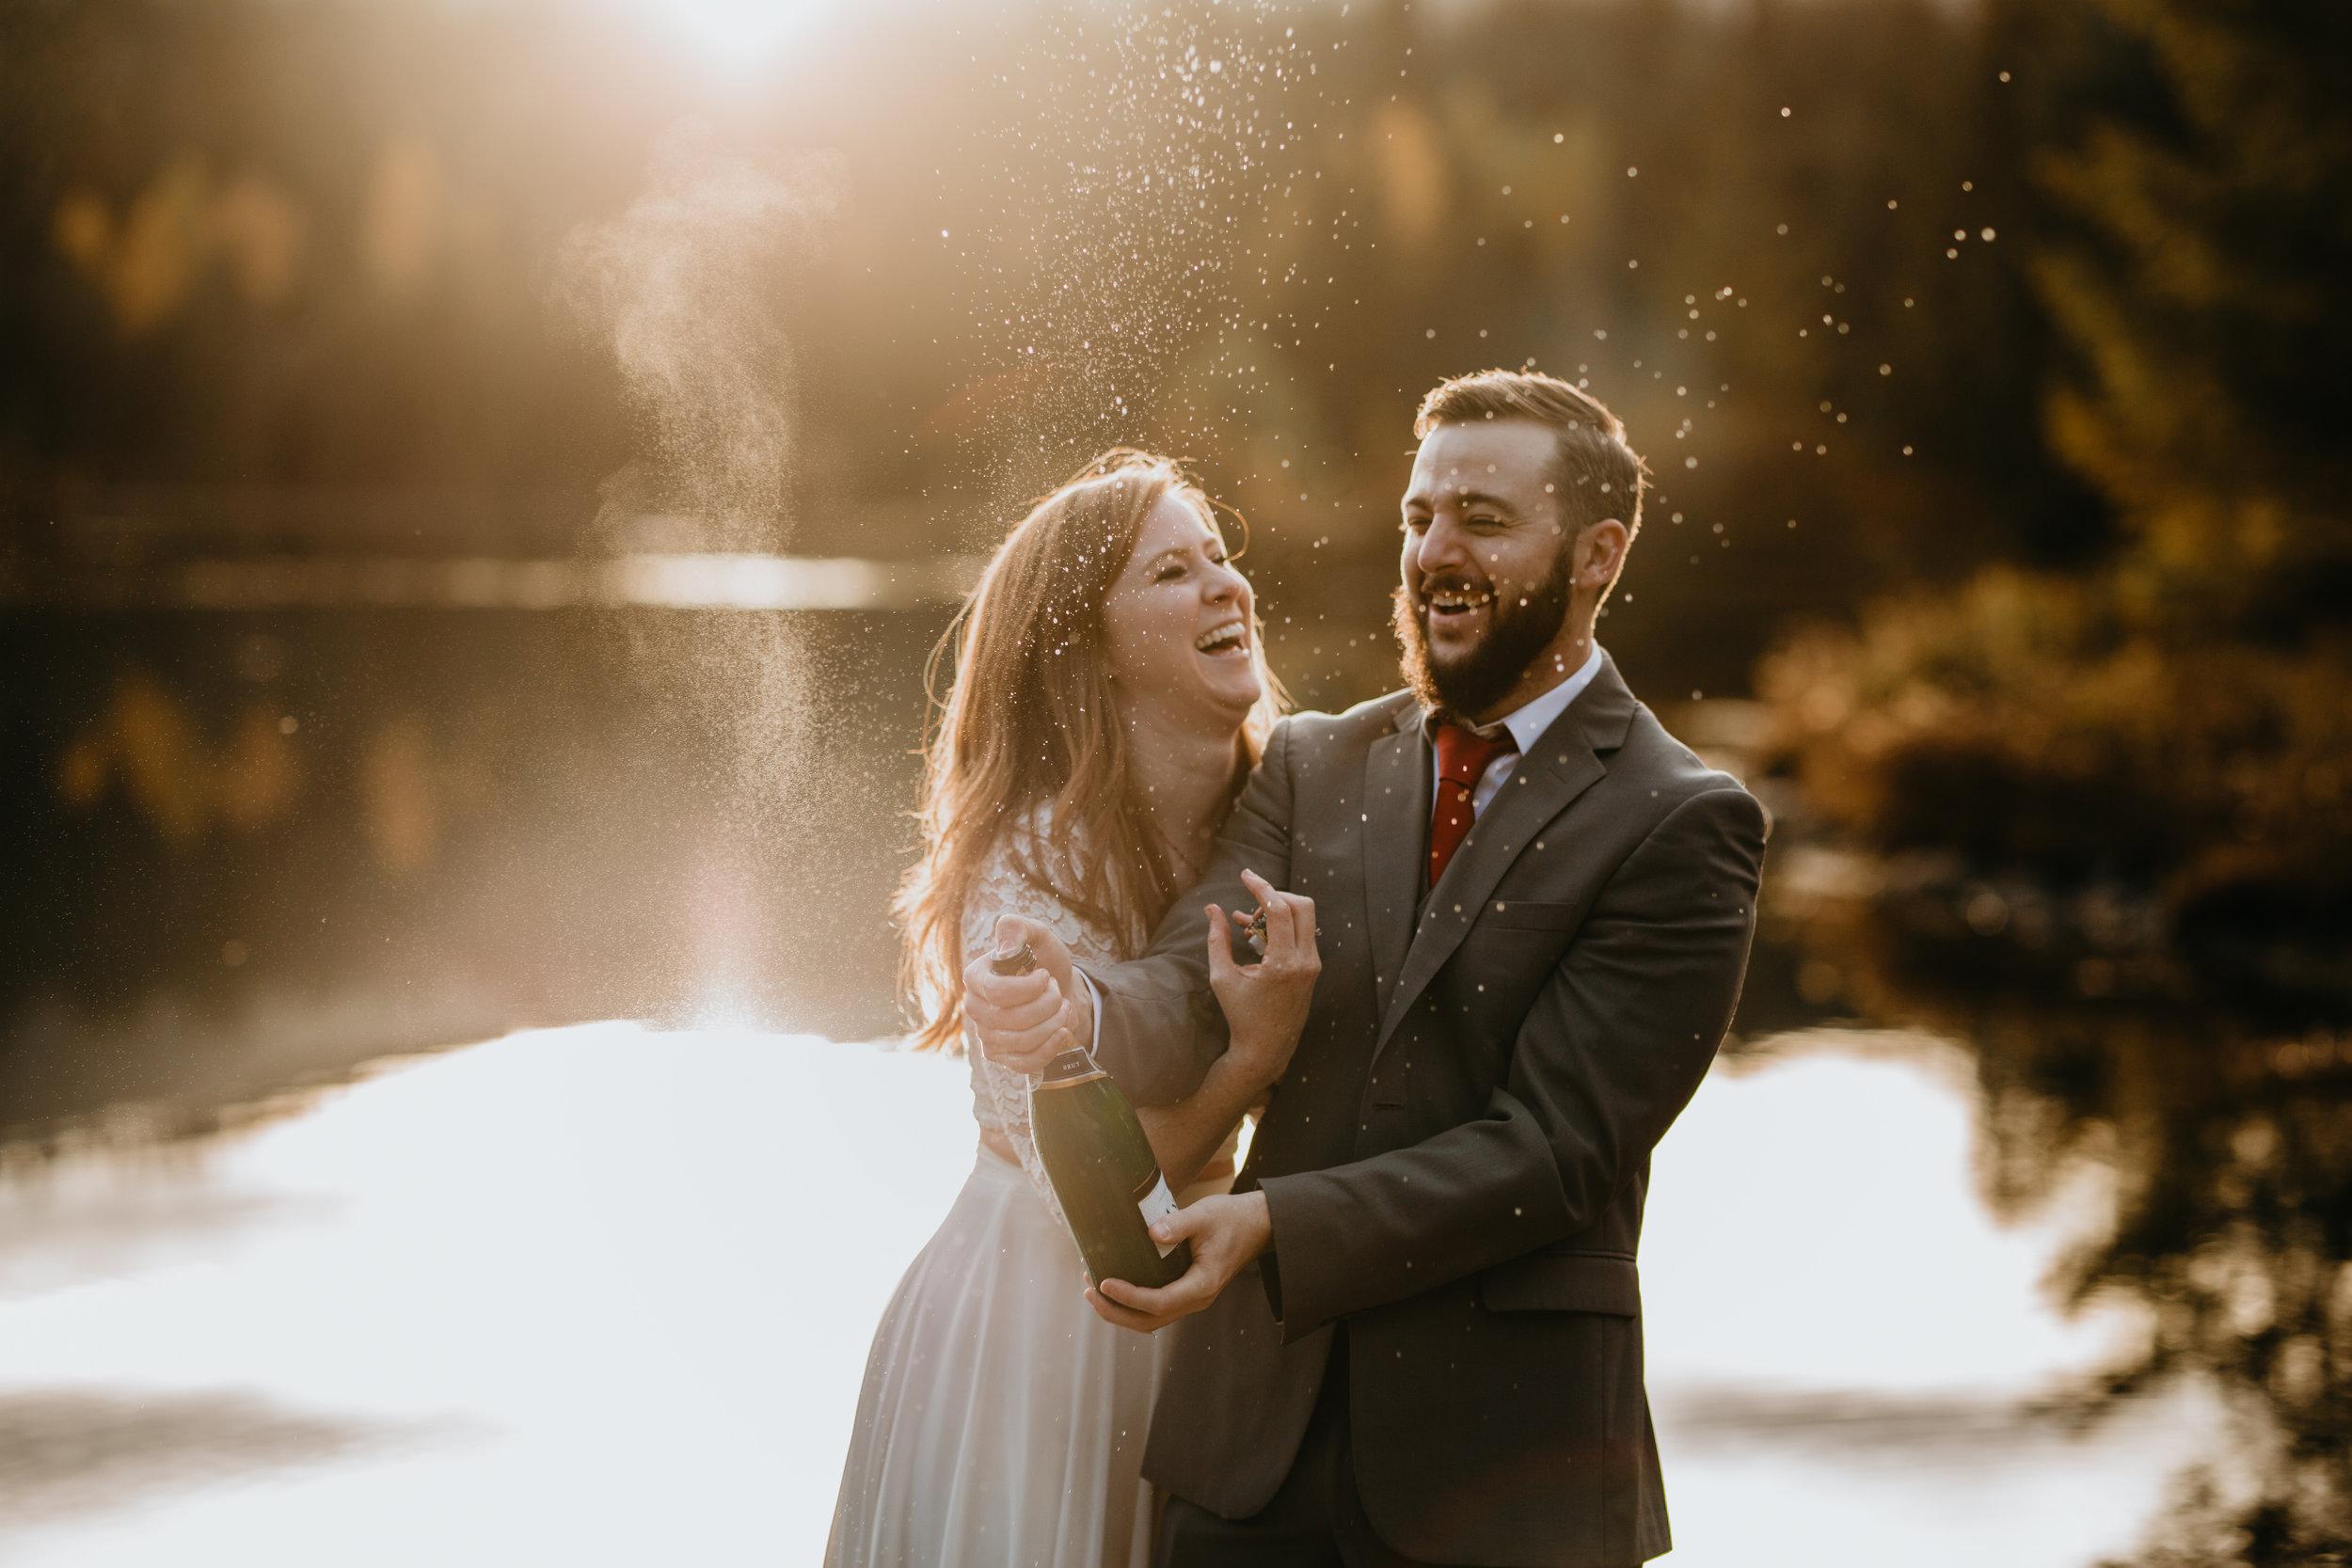 nicole-daacke-photography-mountain-view-elopement-at-gold-creek-pond-snoqualmie-washington-wa-elopement-photographer-photography-adventure-elopement-in-washington-fall-lakeside-golden-sunset-boho-fun-bride-2787.jpg